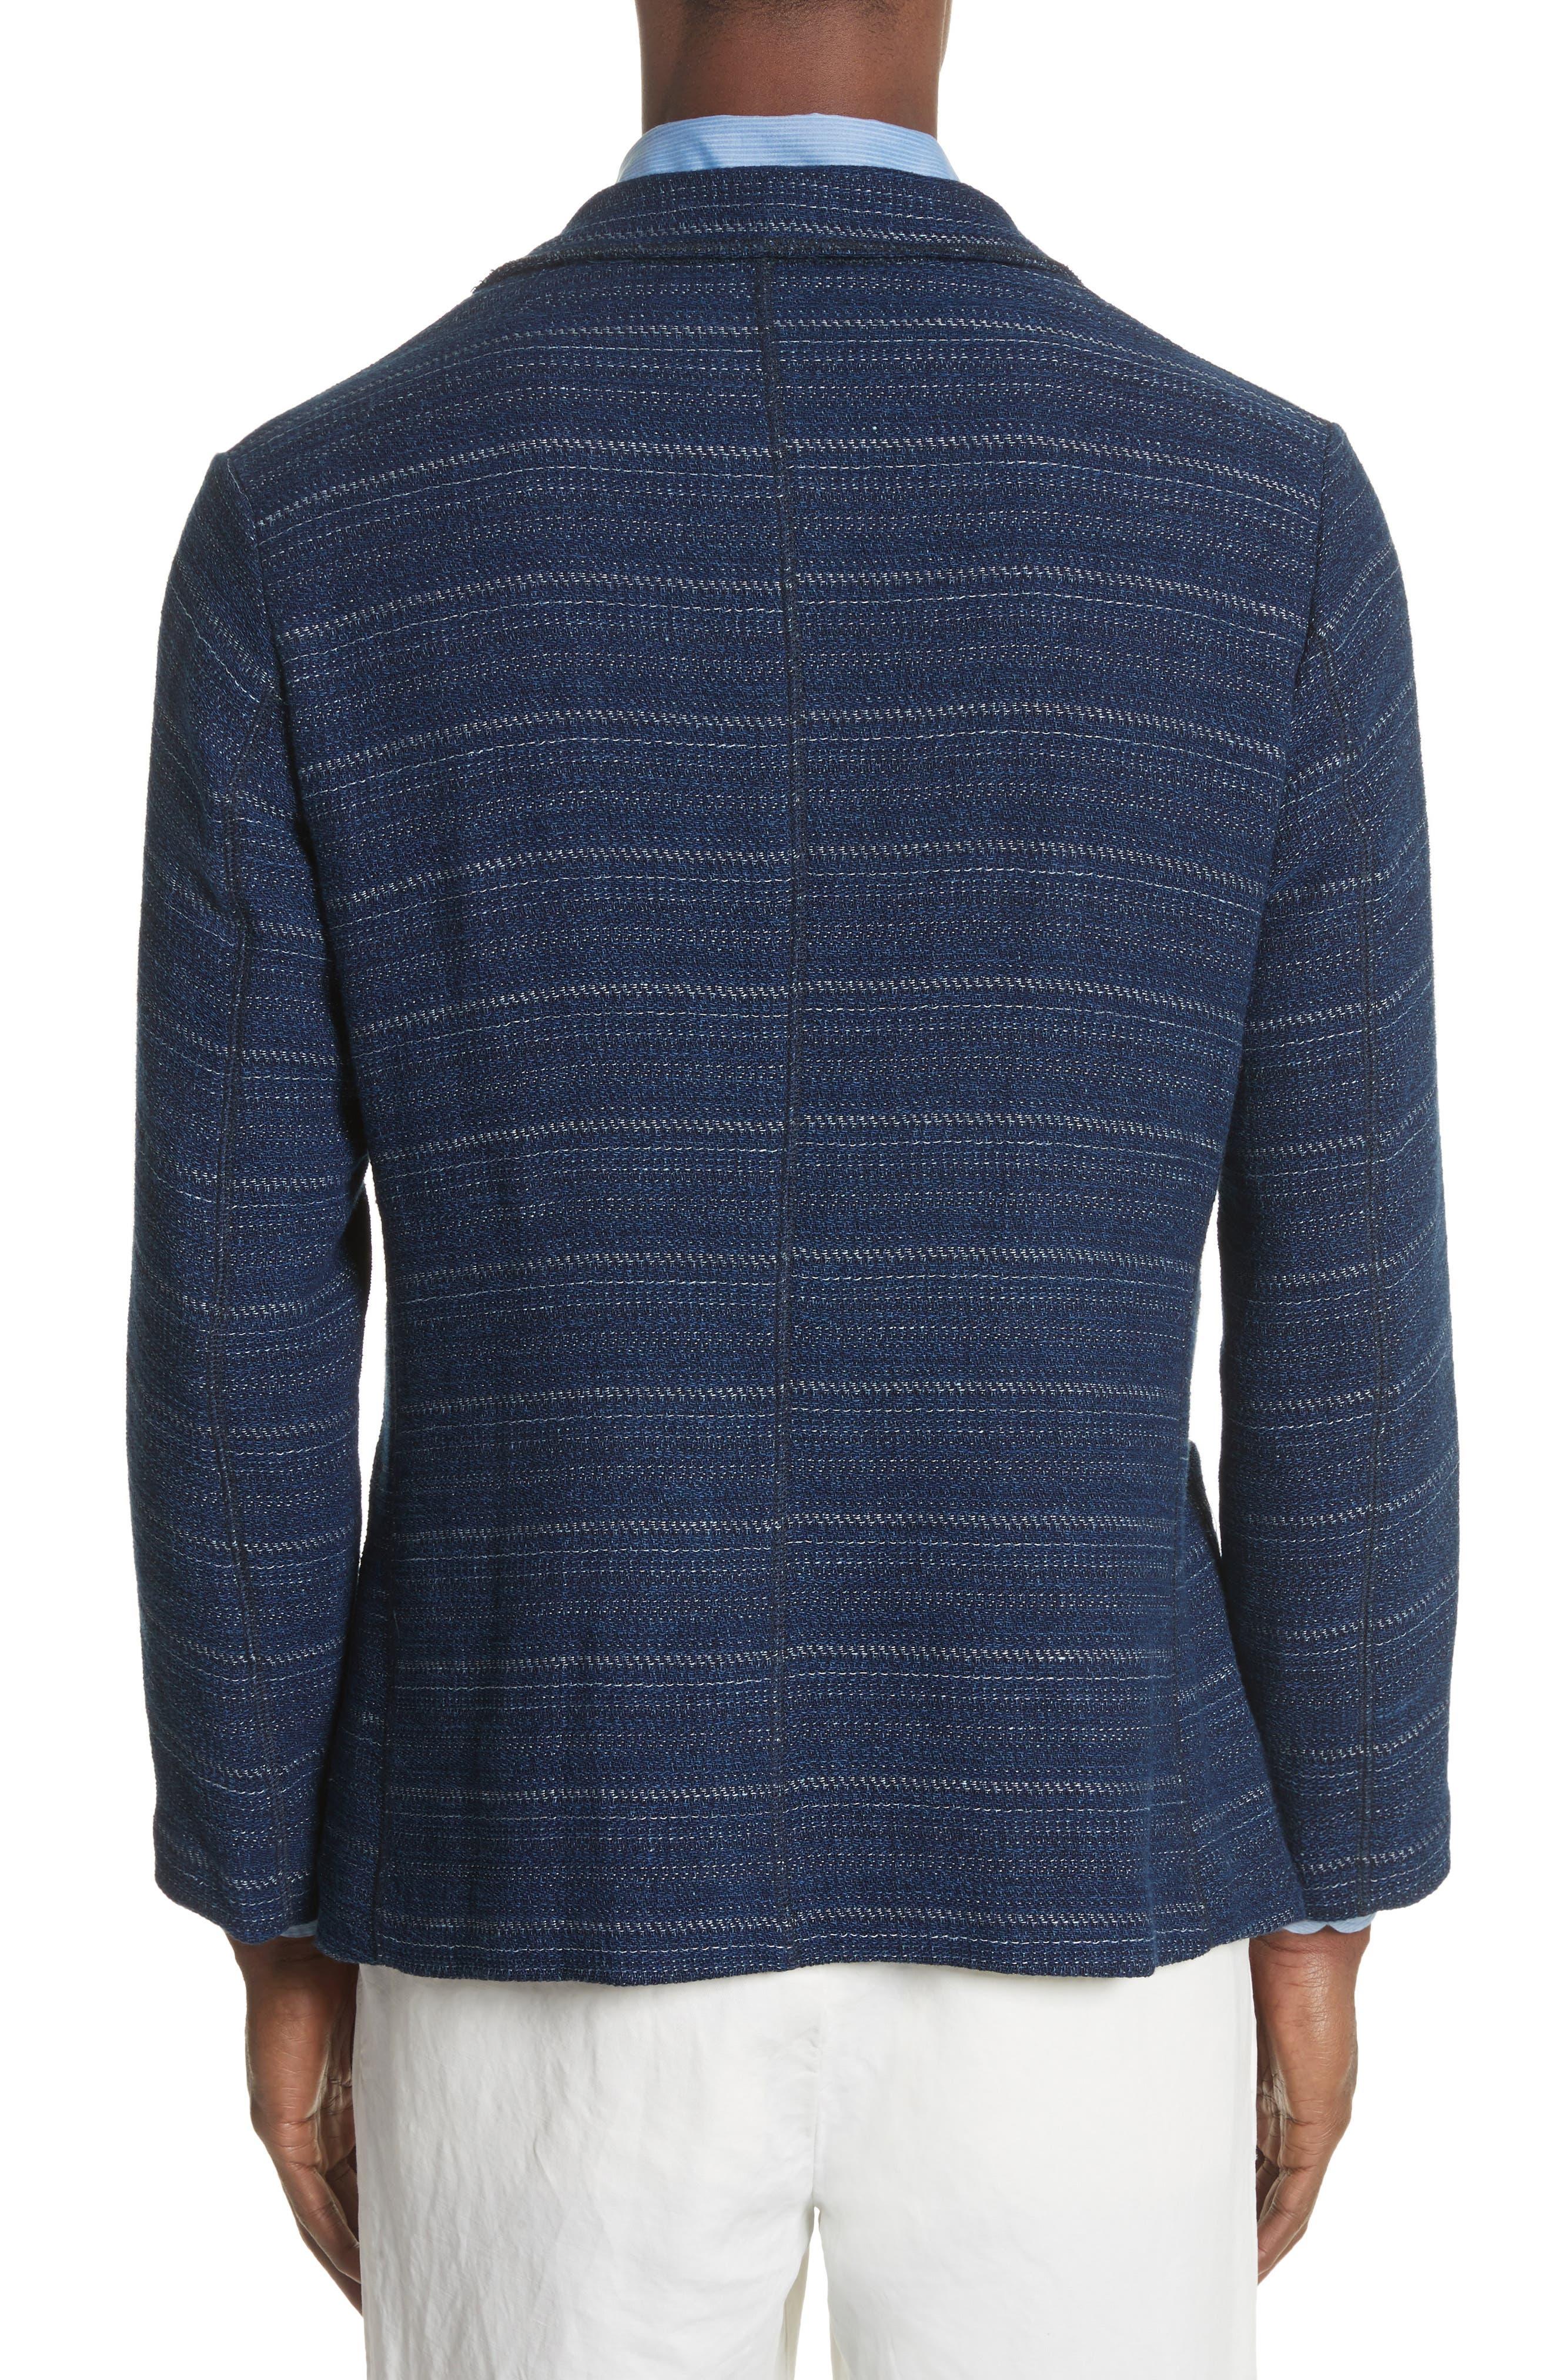 Napoli Nicola Barre Stripe Cotton & Linen Jacket,                             Alternate thumbnail 2, color,                             410